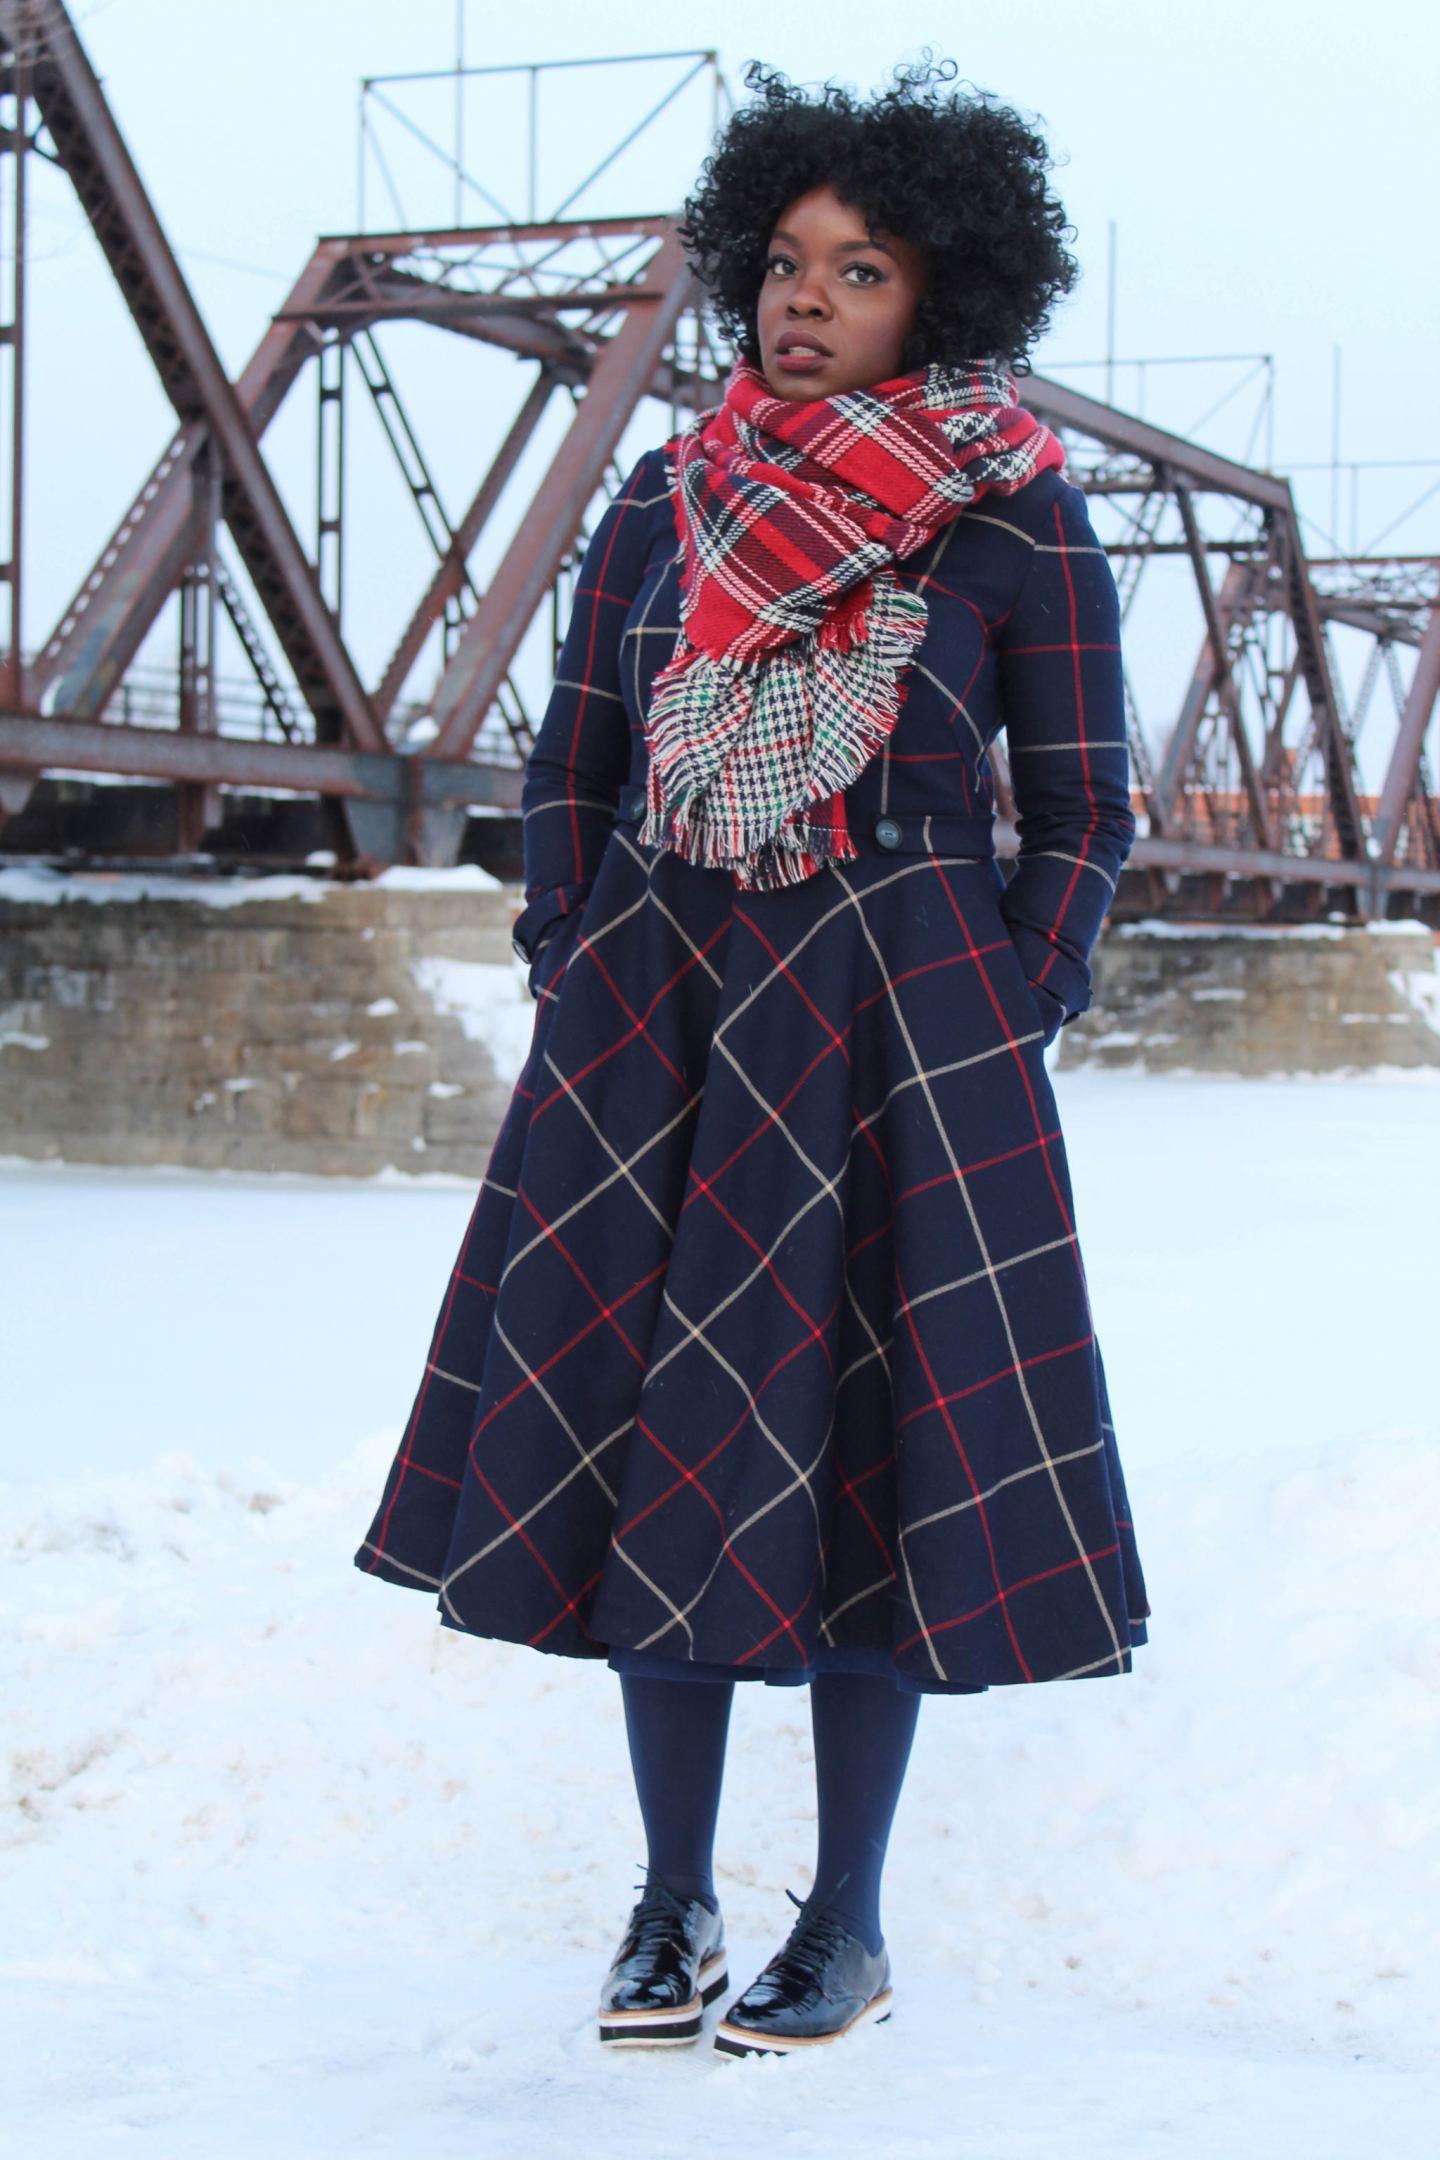 DIY Tweed Dress using Vogue 8615 pattern - Yes I Made My Dress